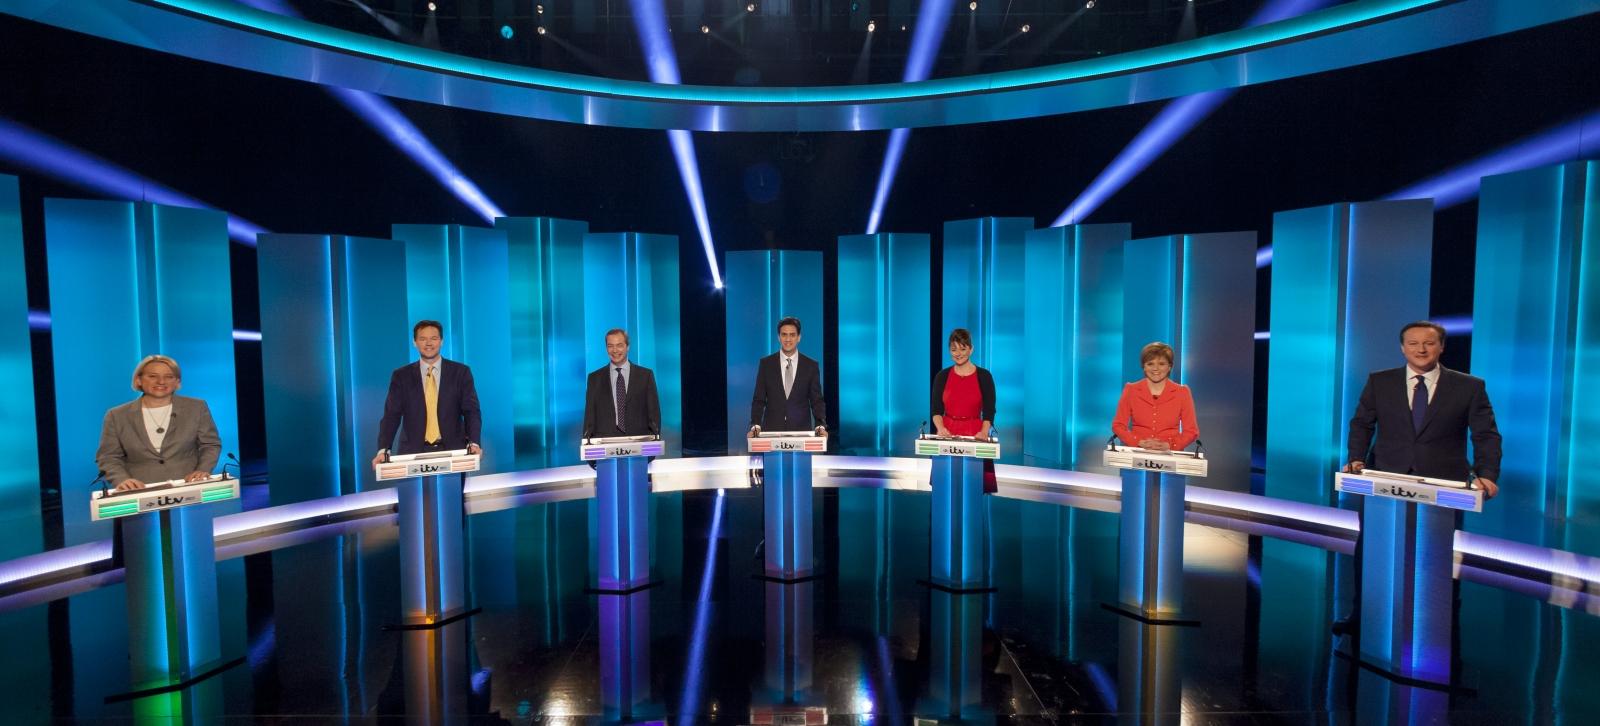 TV debates